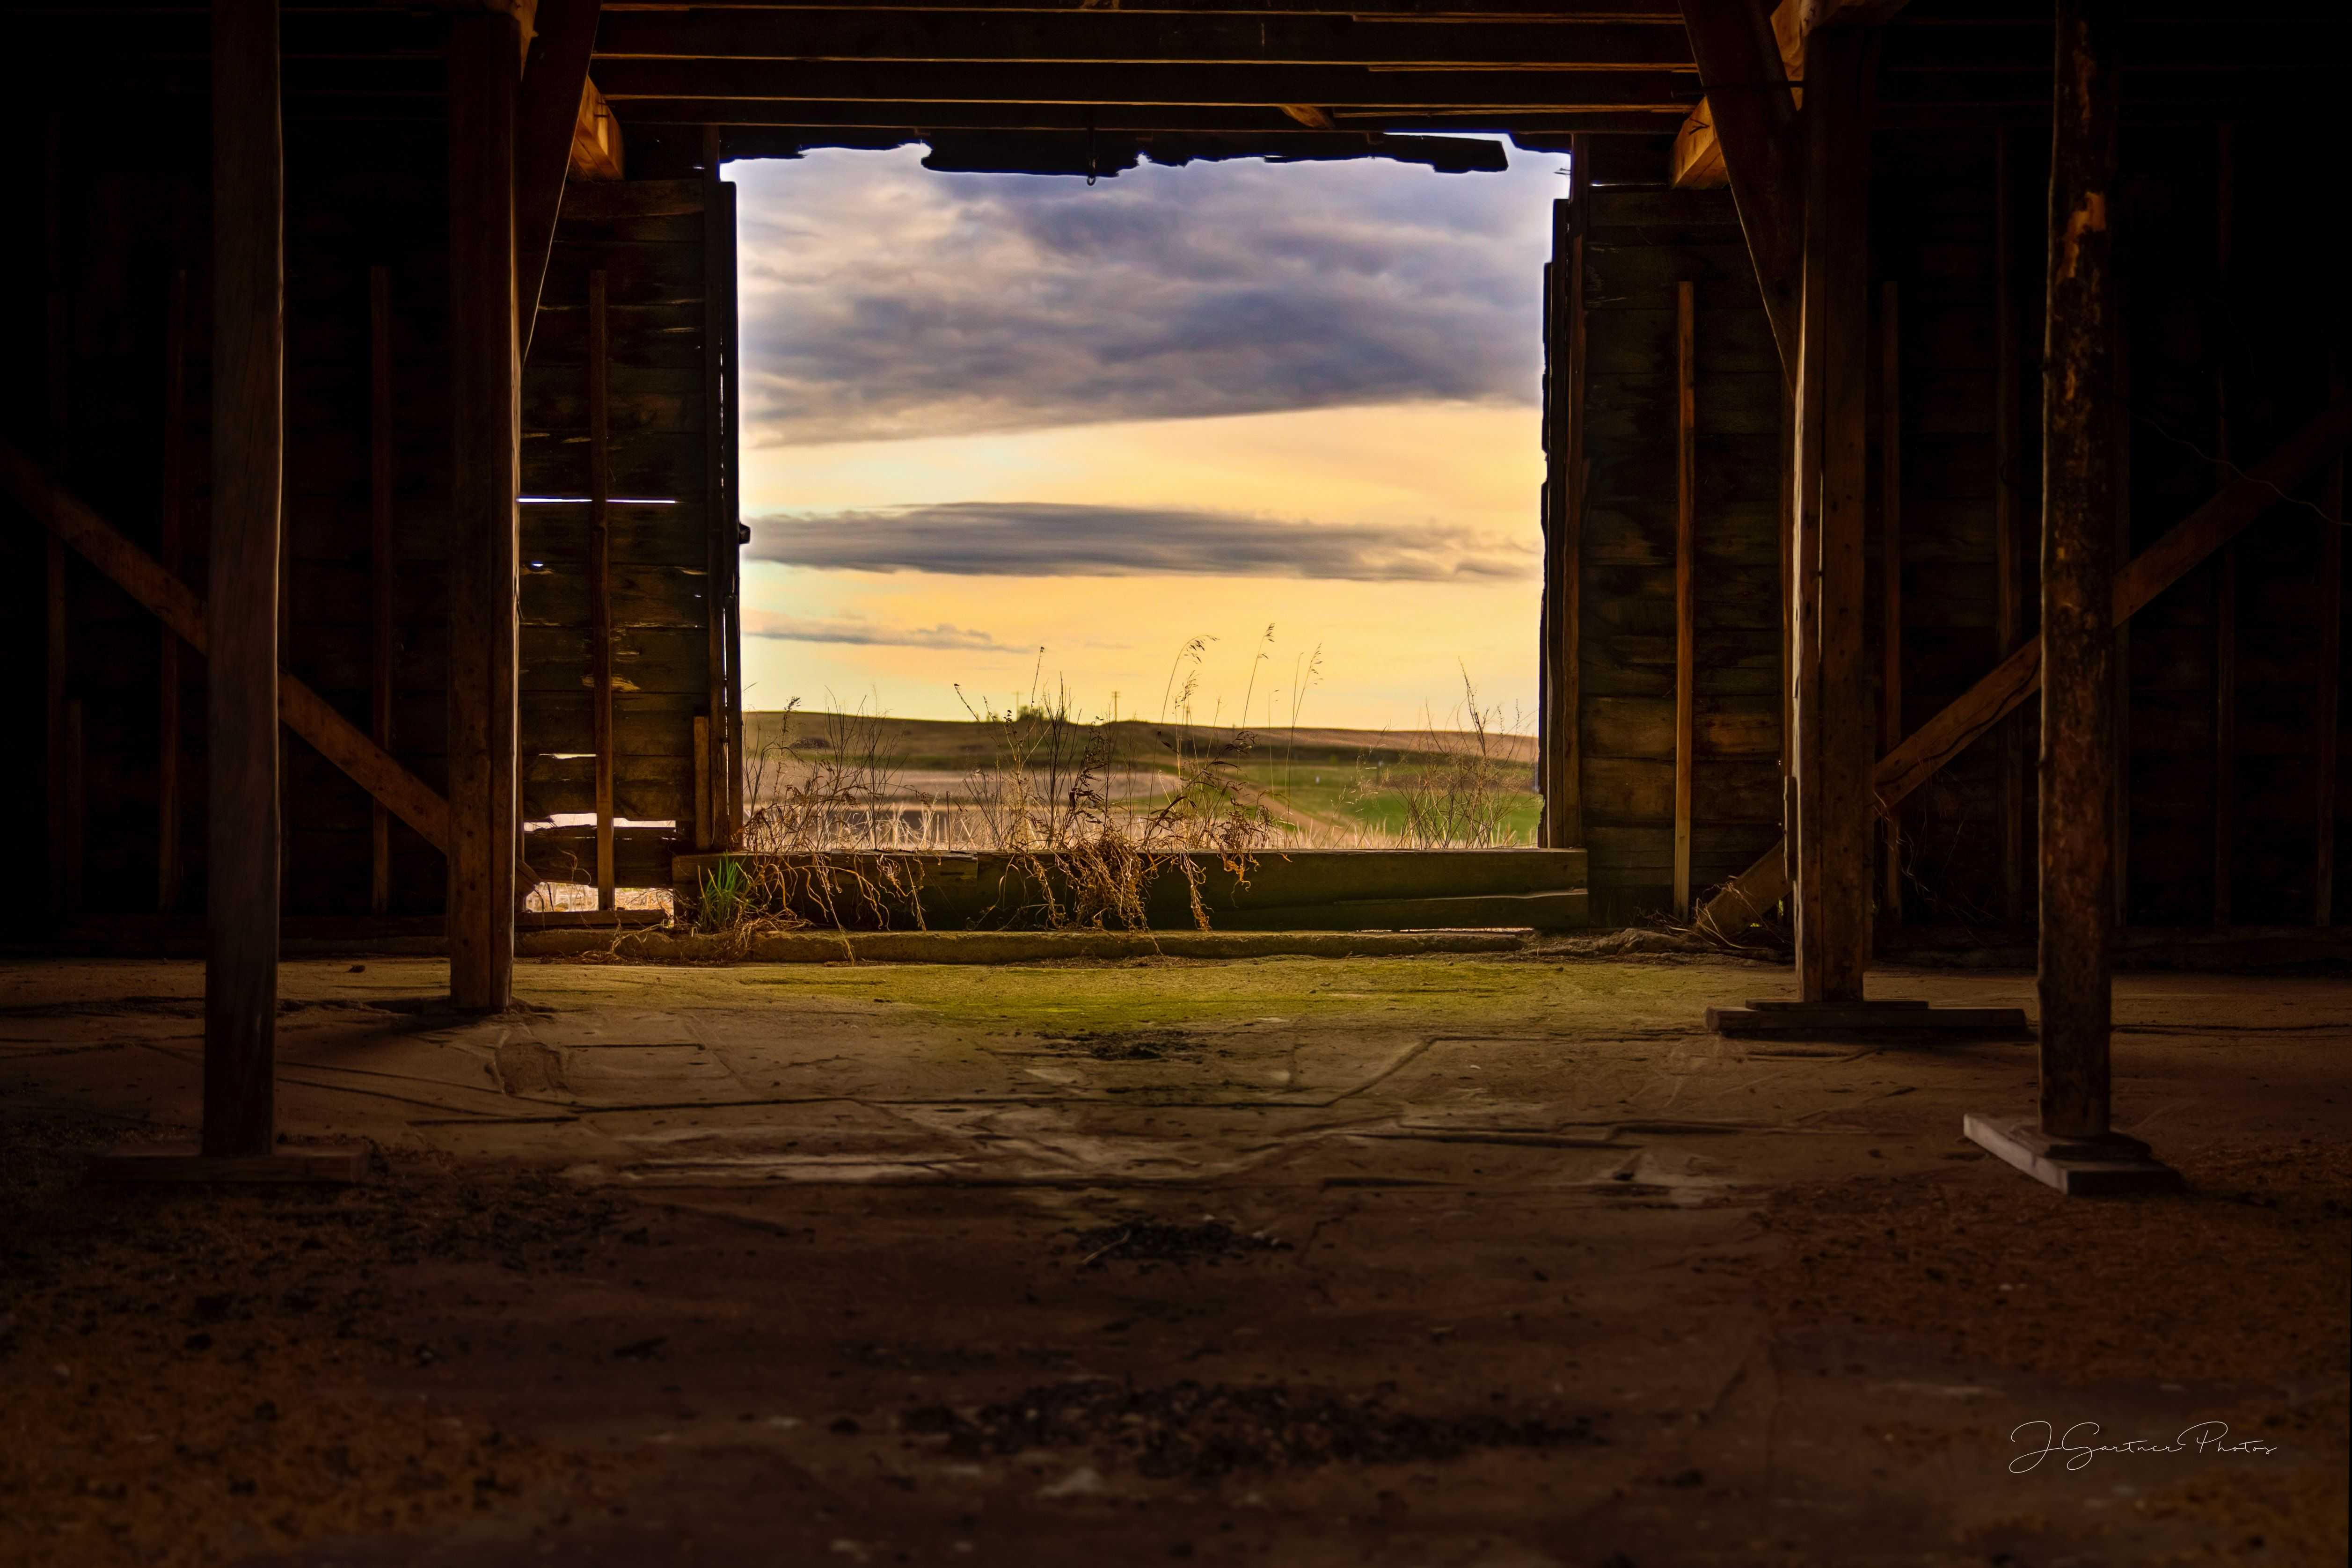 Seeing Rural Landscape Through The Barn Door Photography Window